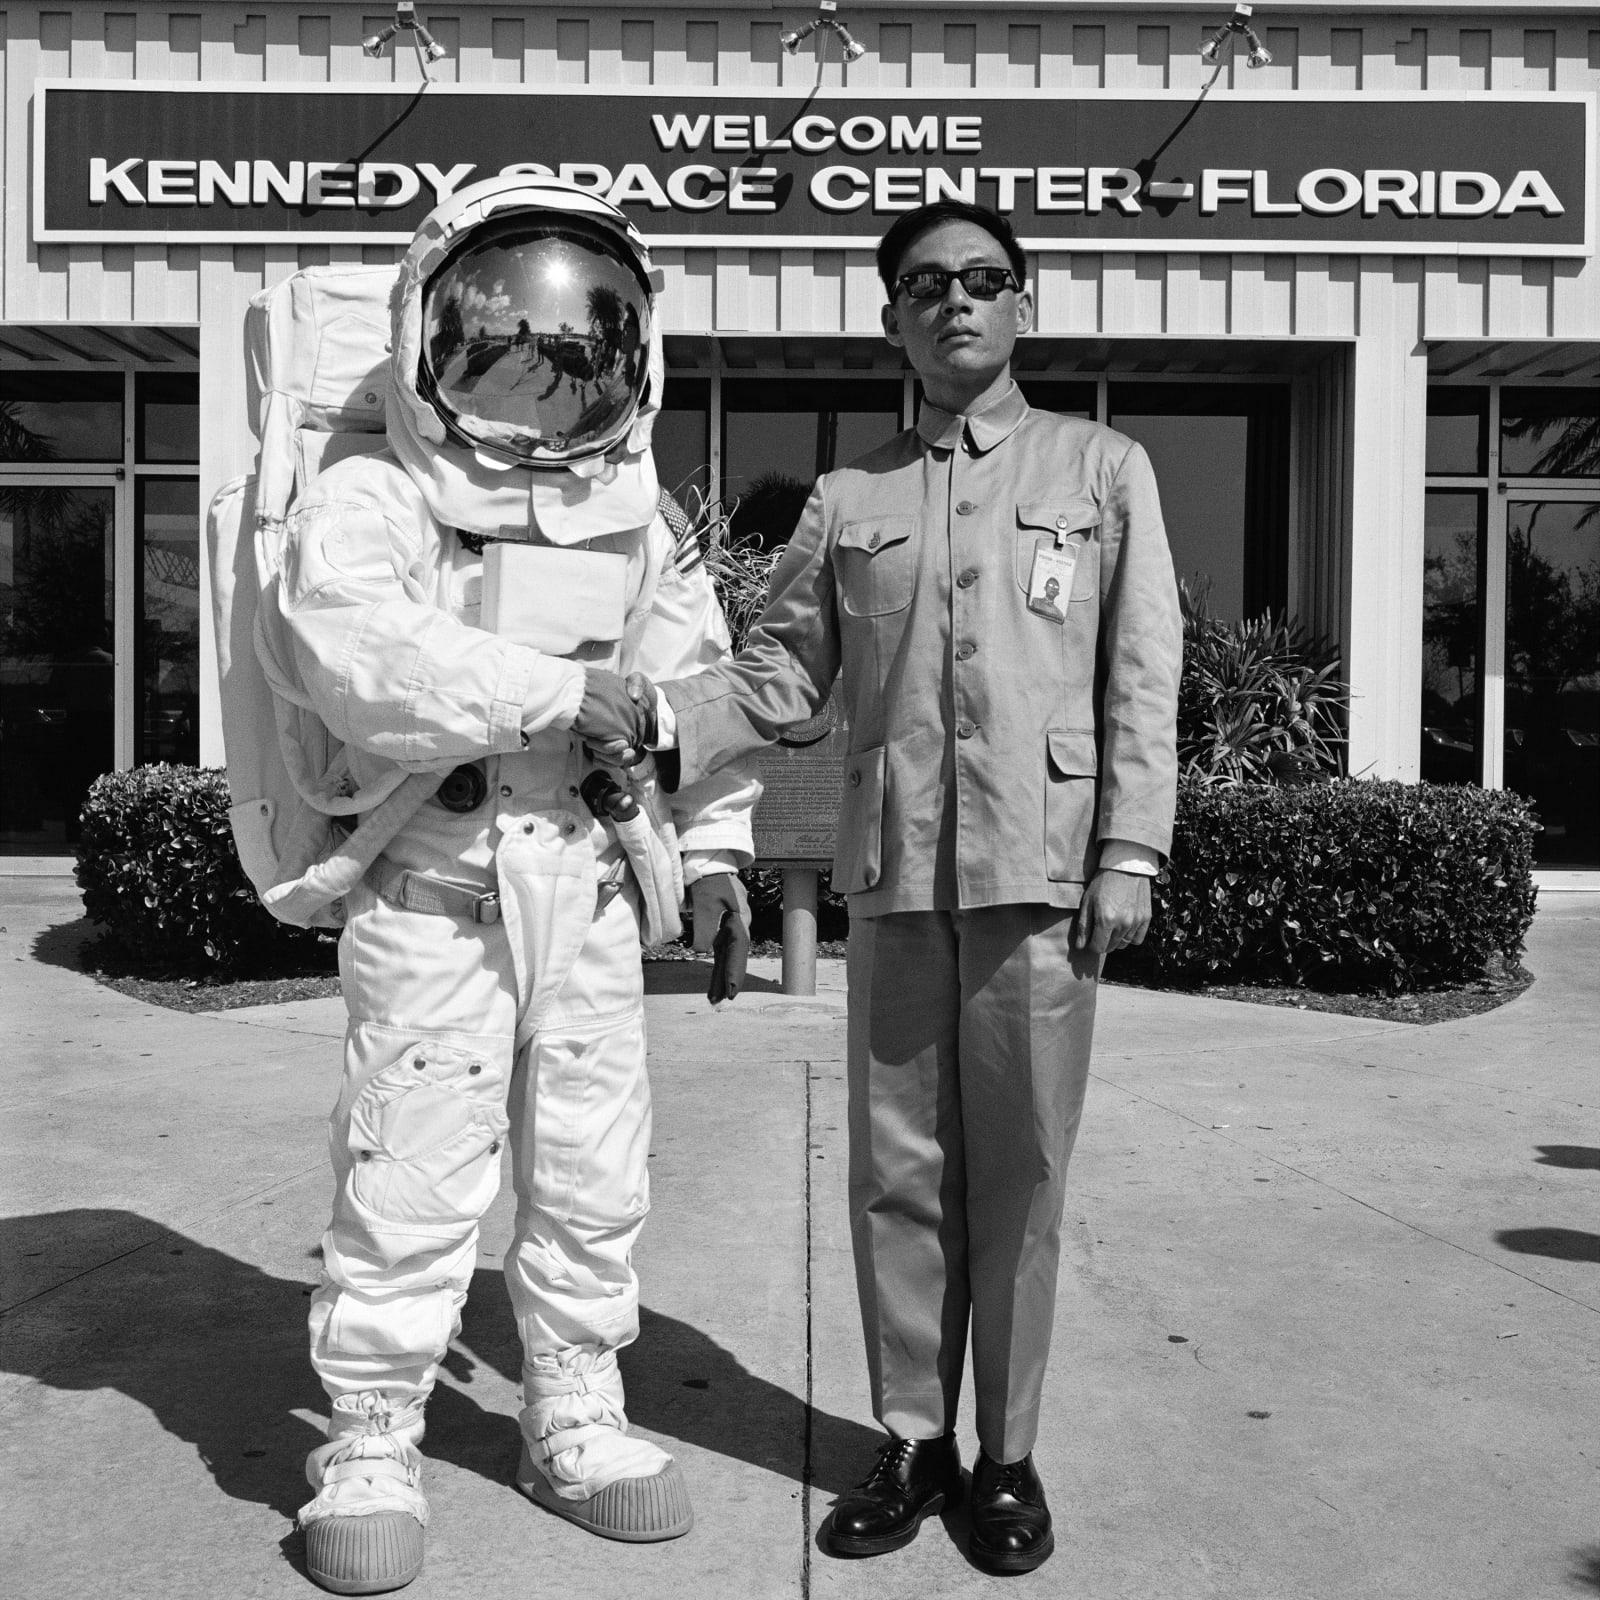 Tseng Kwong Chi (1950- 1990), Cape Canaveral, Florida (Astronaut), 1985